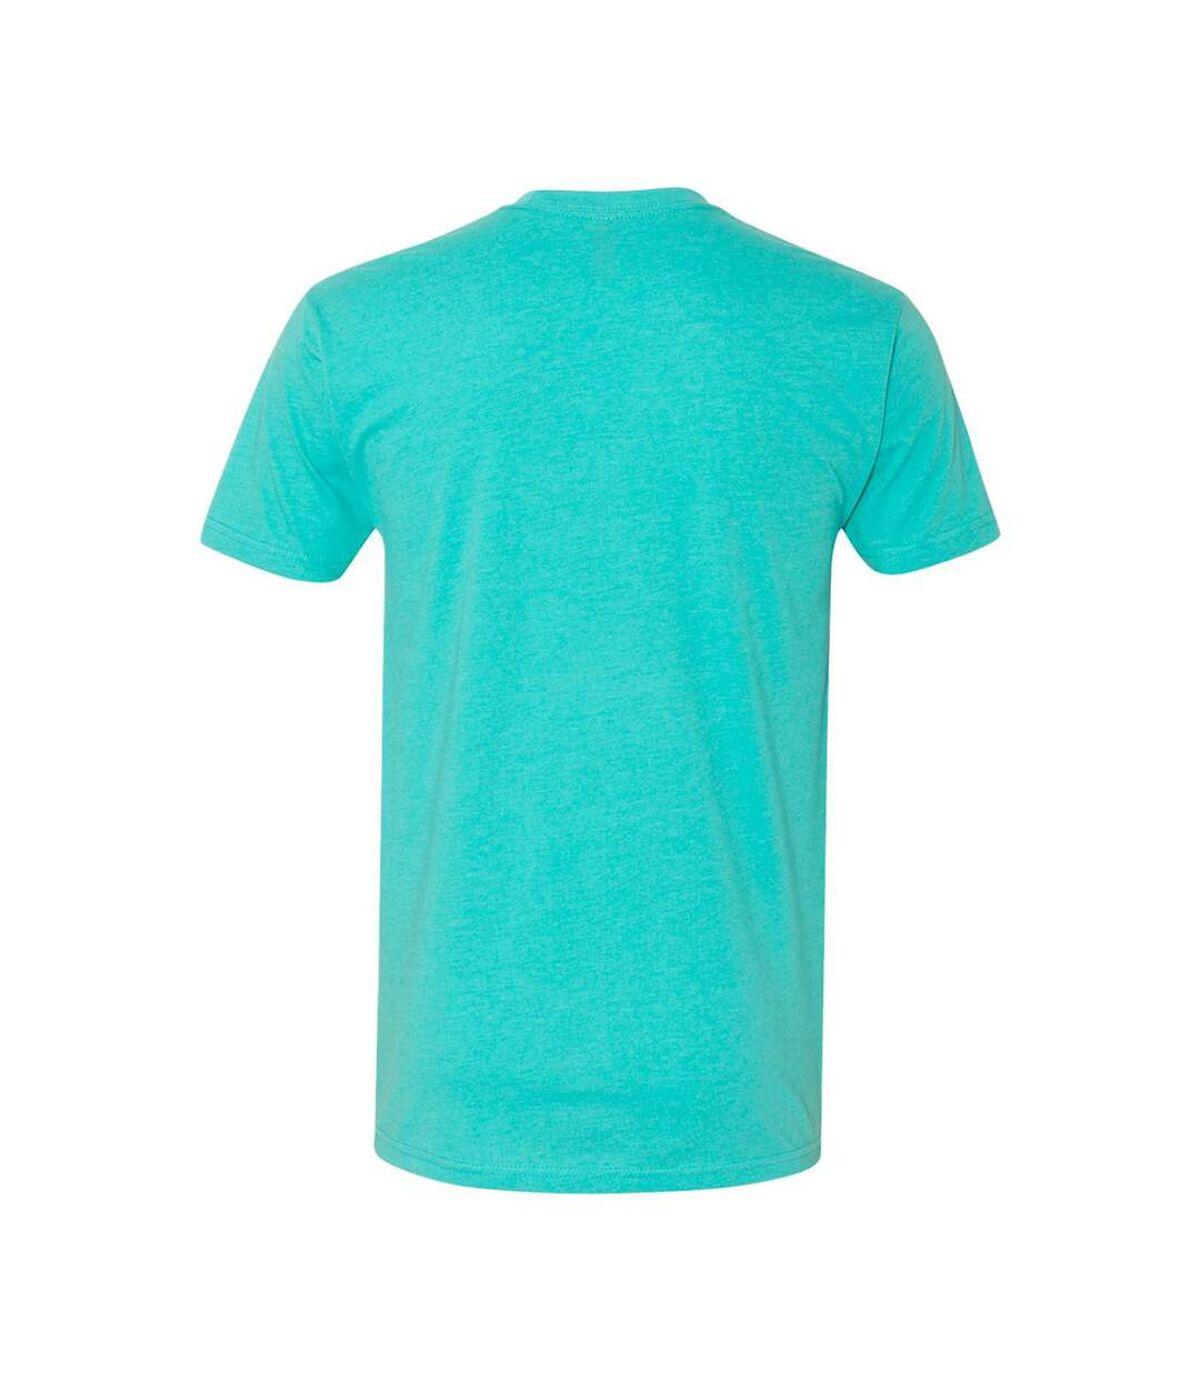 Next Level Adults Unisex CVC Crew Neck T-Shirt (Tahiti Blue) - UTPC3480